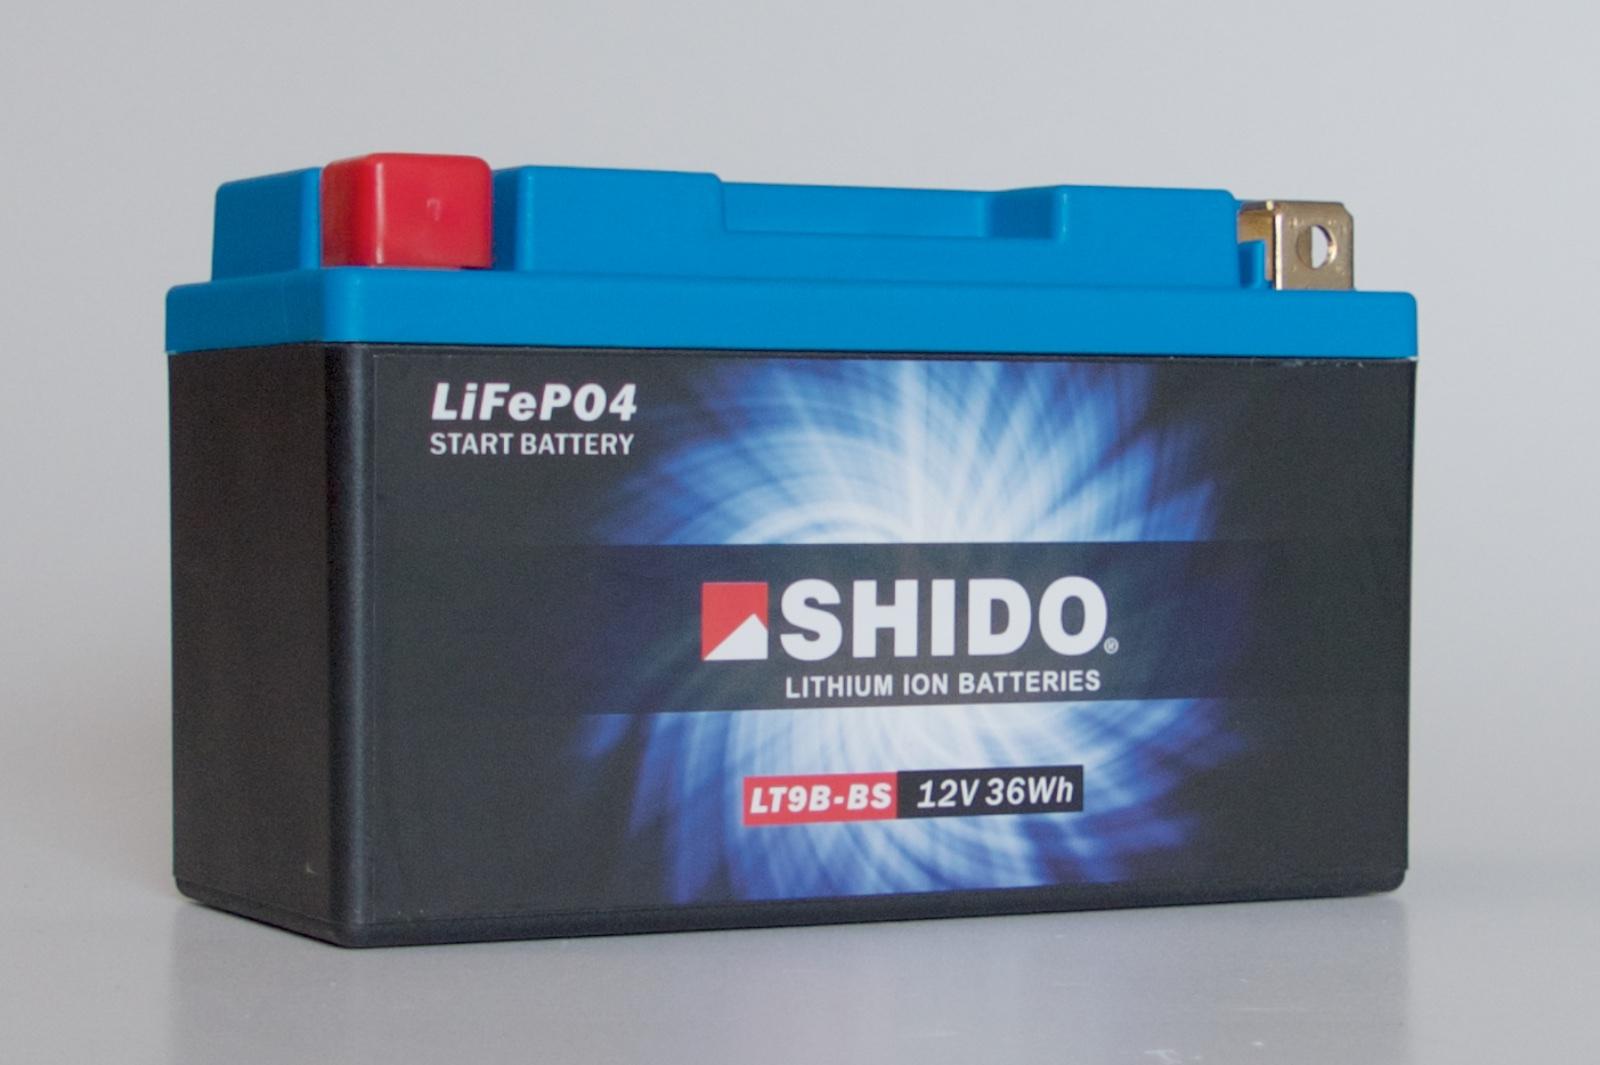 shido lithium batterie lt9b bs batterie. Black Bedroom Furniture Sets. Home Design Ideas